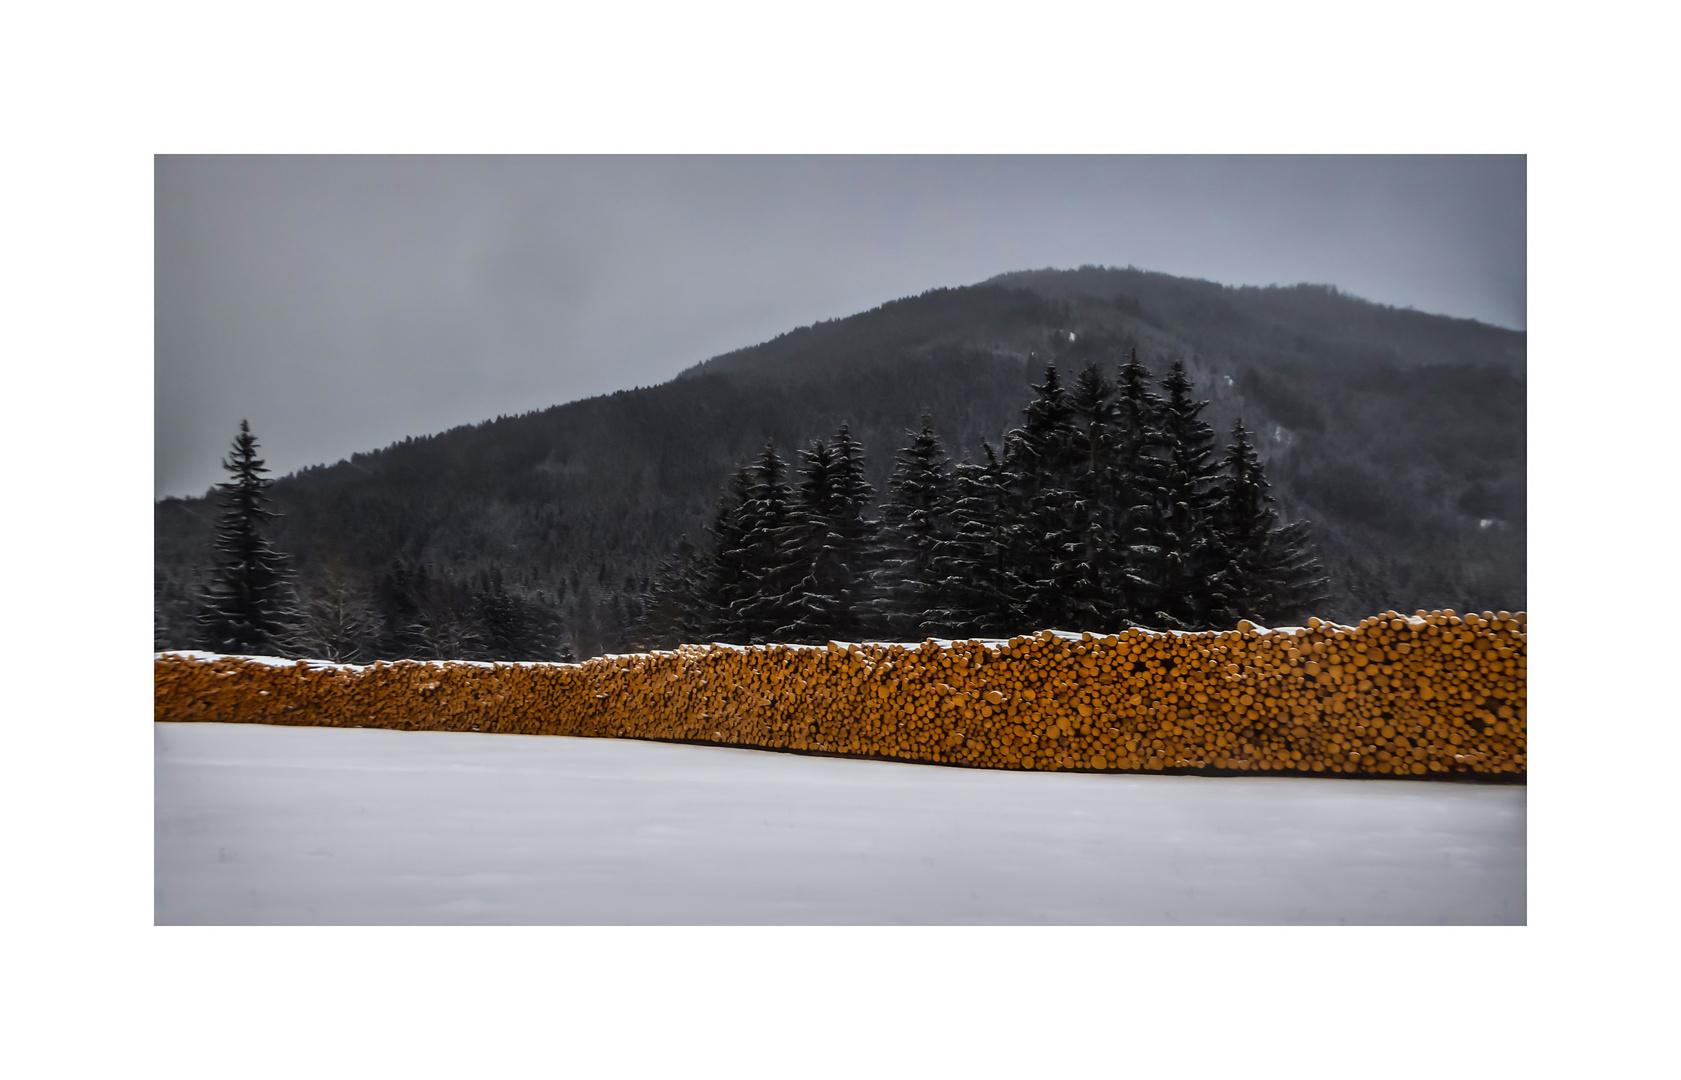 silence.of.winter